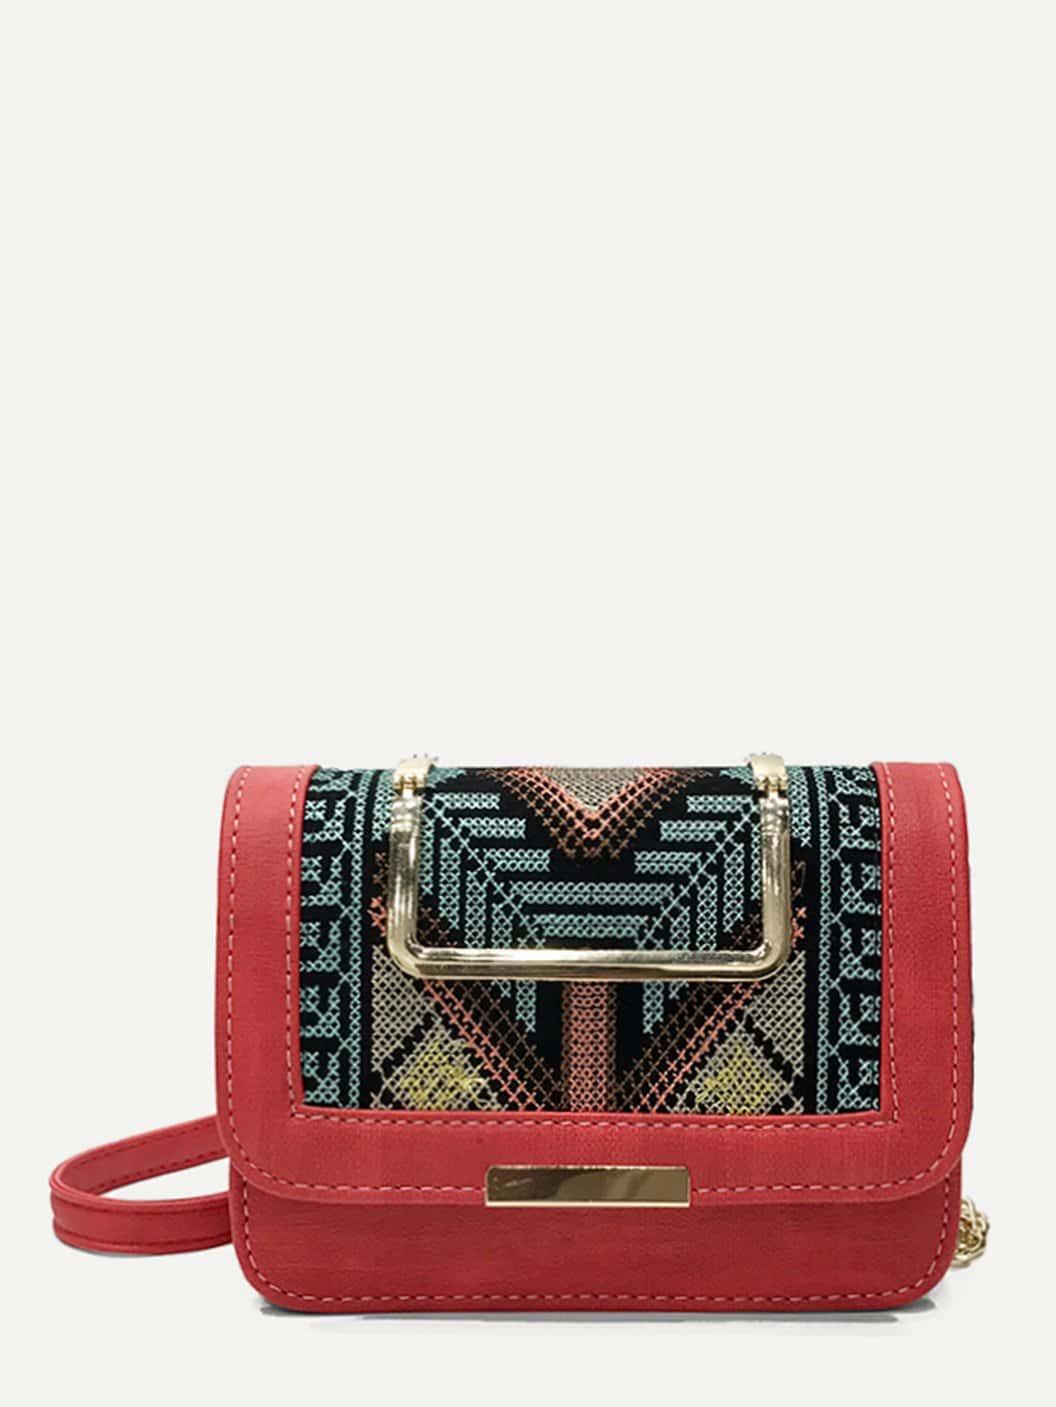 Stitch Trim Detail Embroidery Crossbody Bag